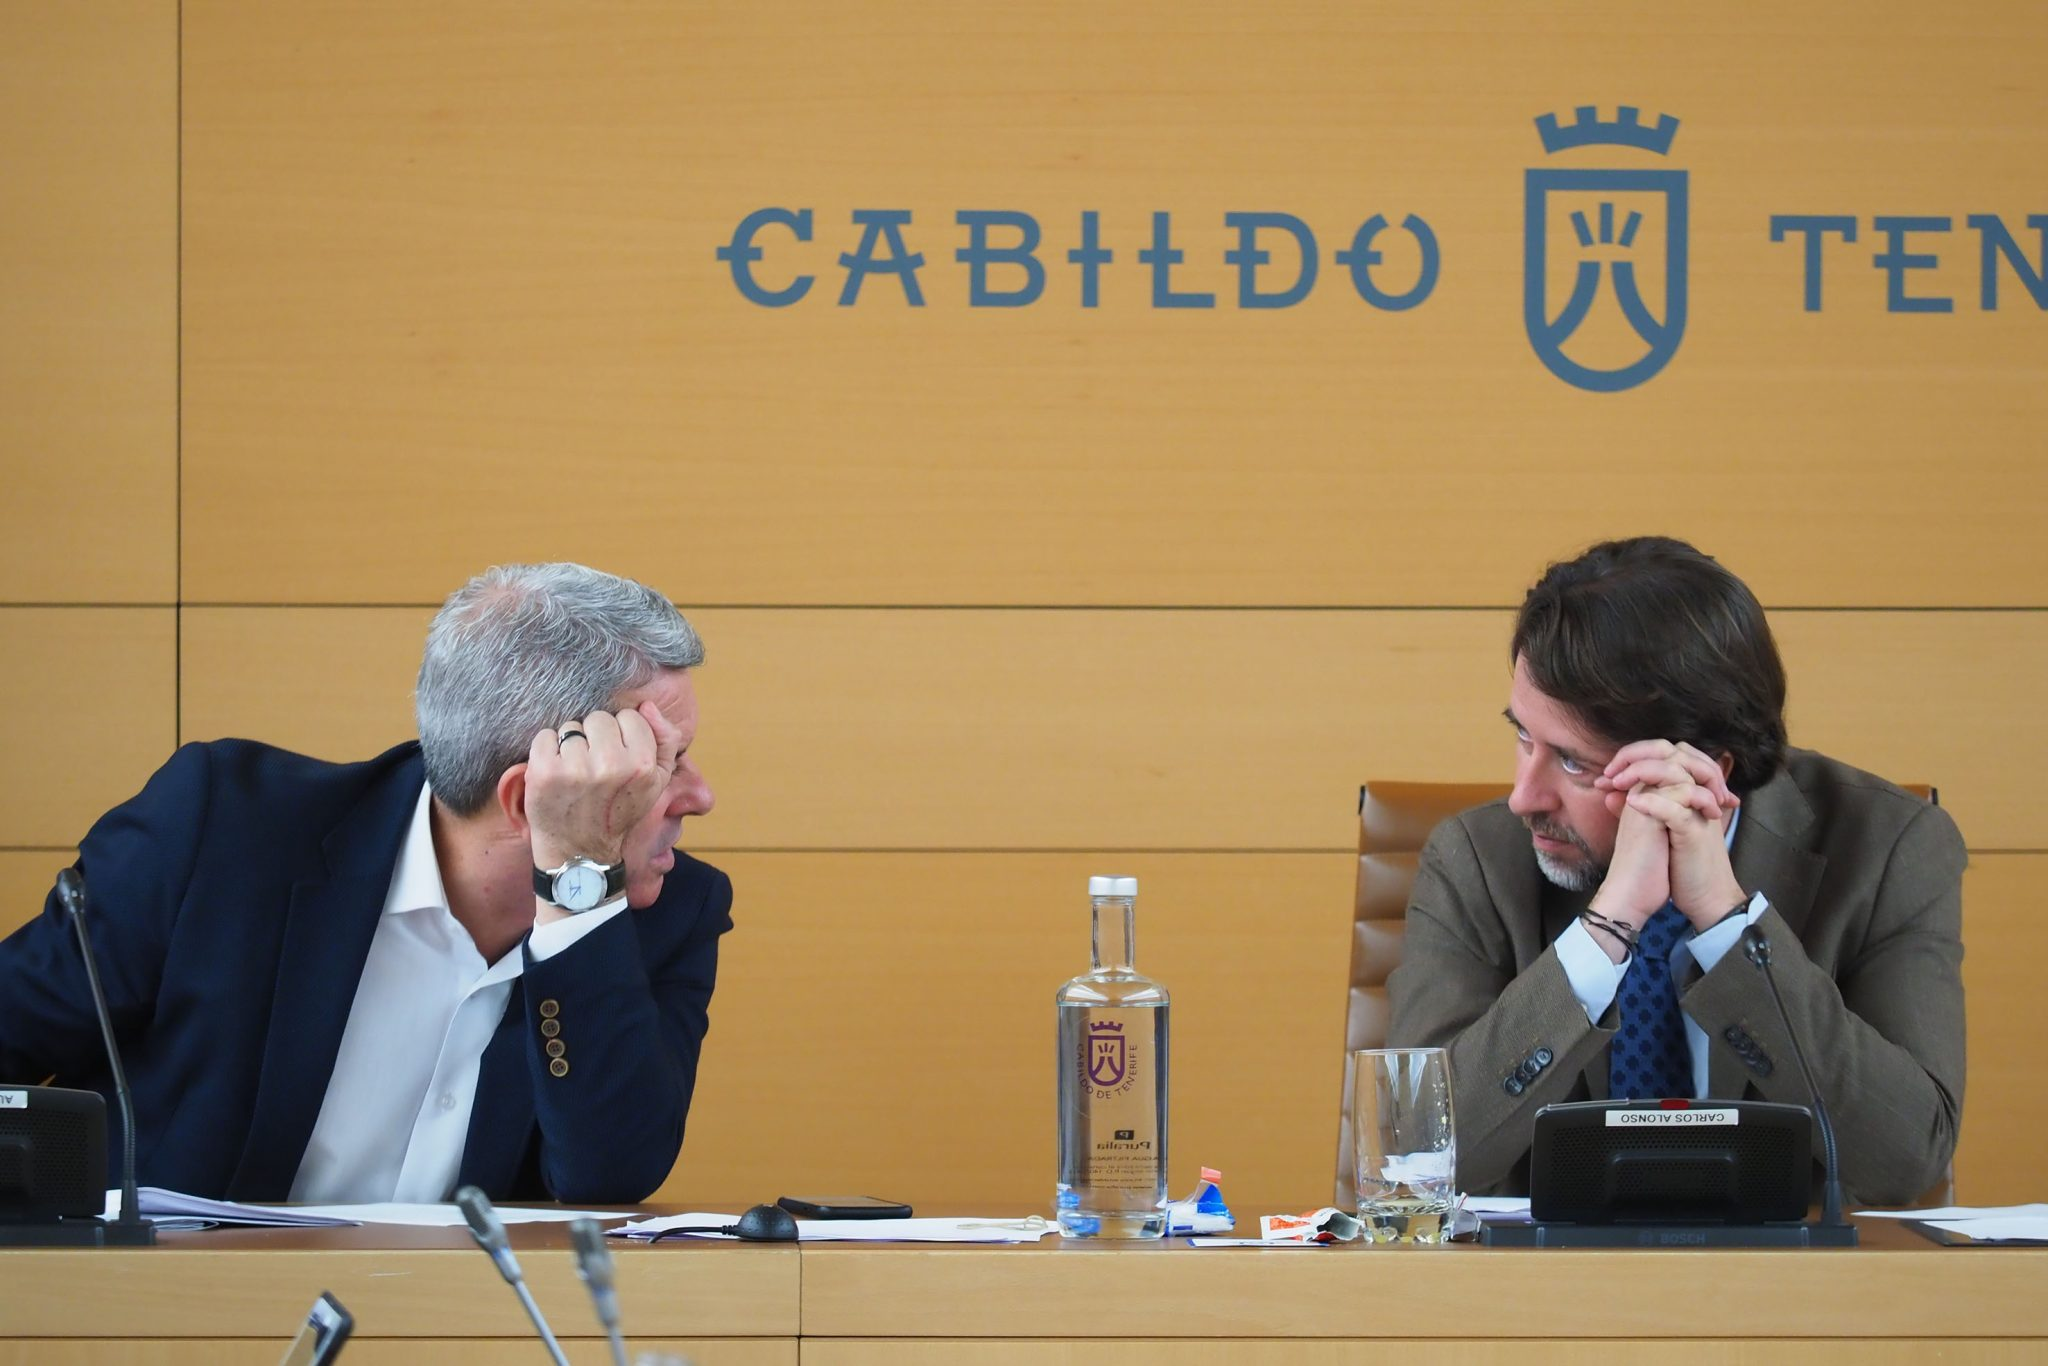 El vicepresidente del Cabildo Aurelio Abreu (PSOE) dialoga con el presidente insular, Carlos Alonso (CC). DA